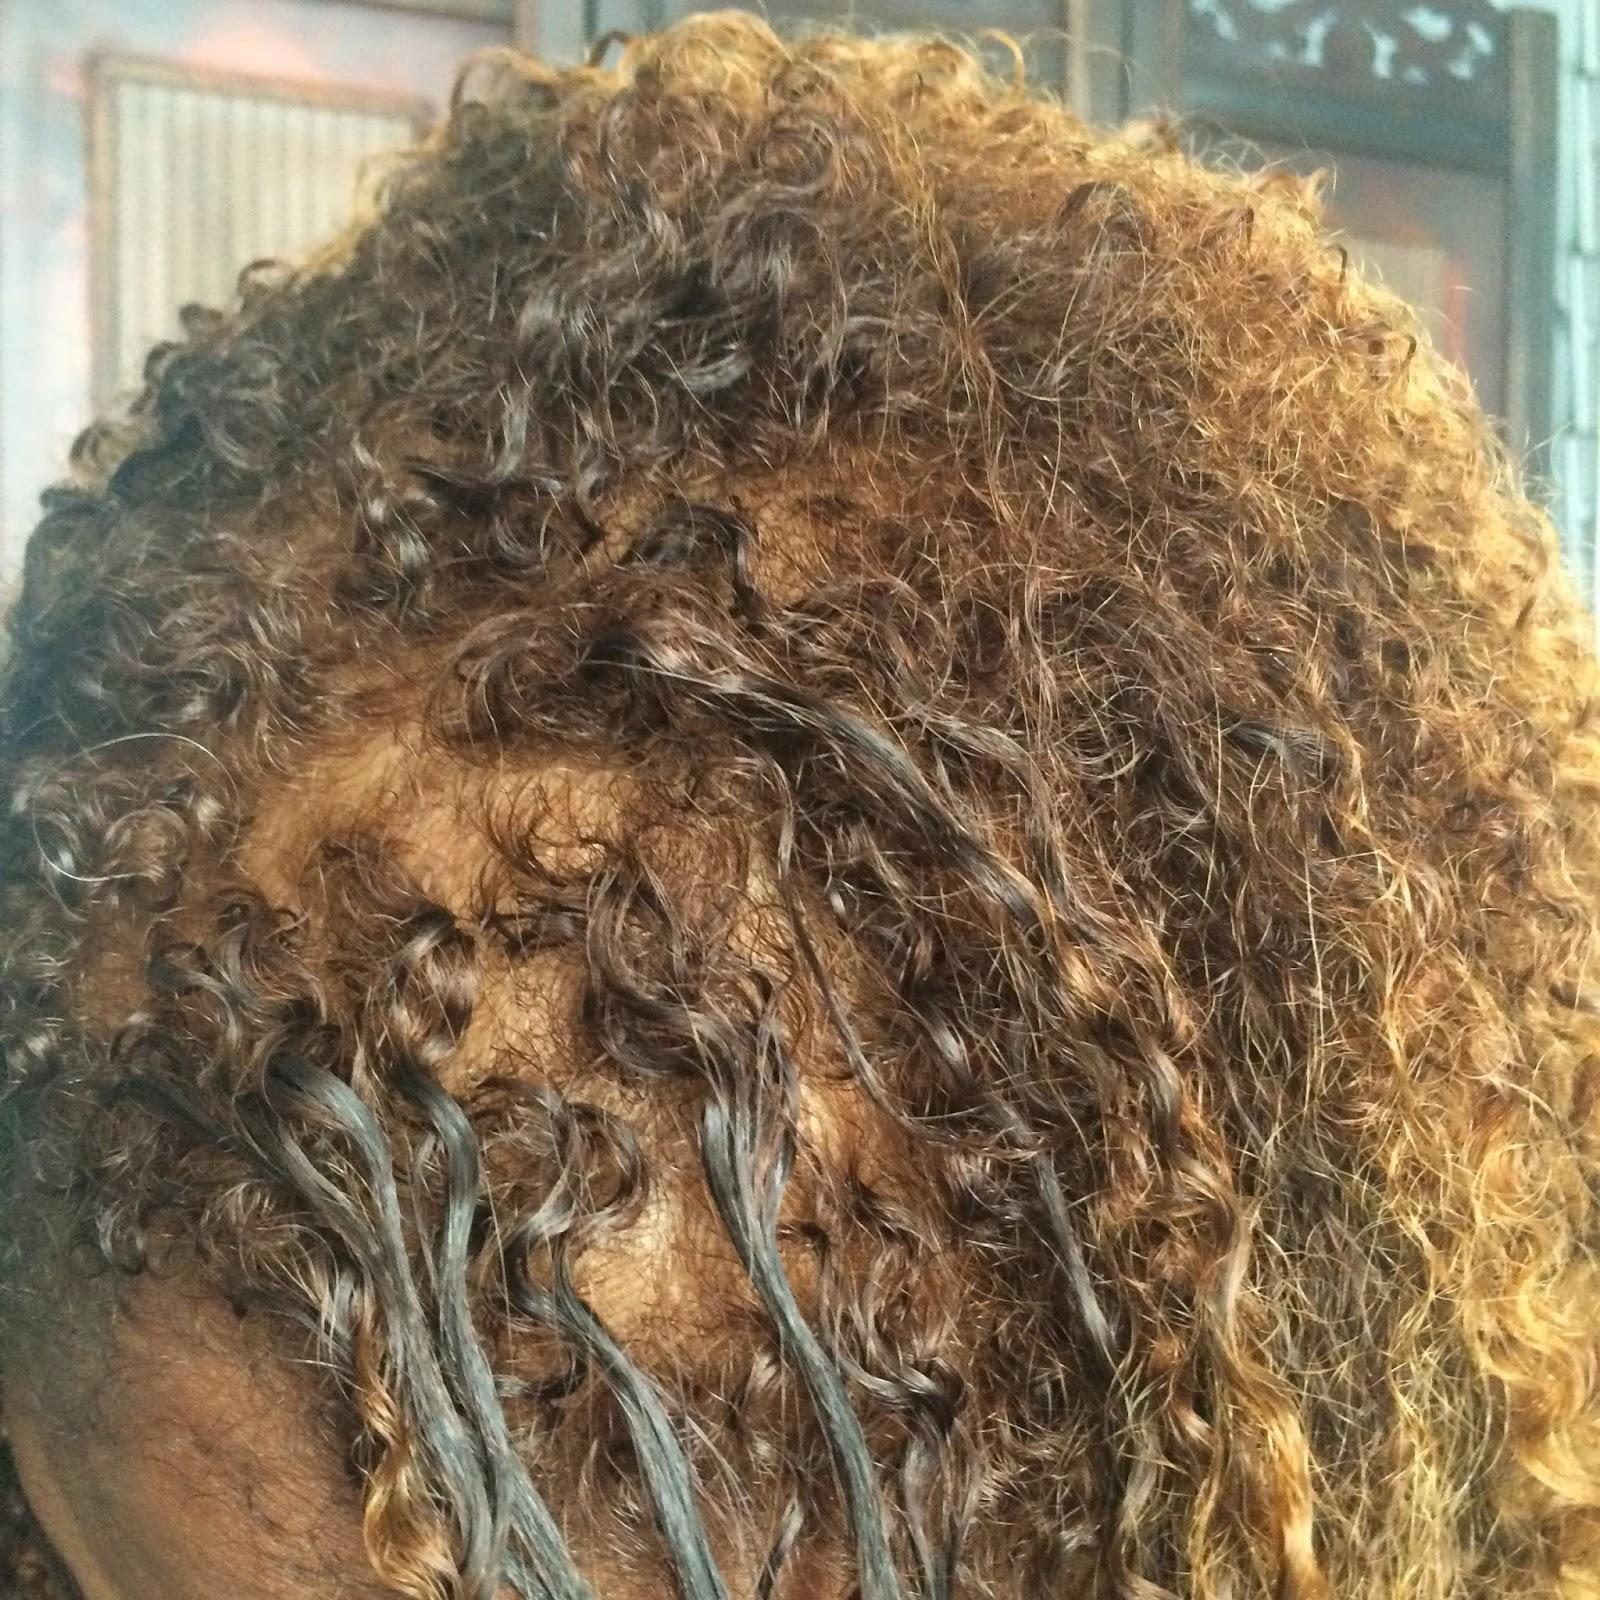 clairol hair dye instructions